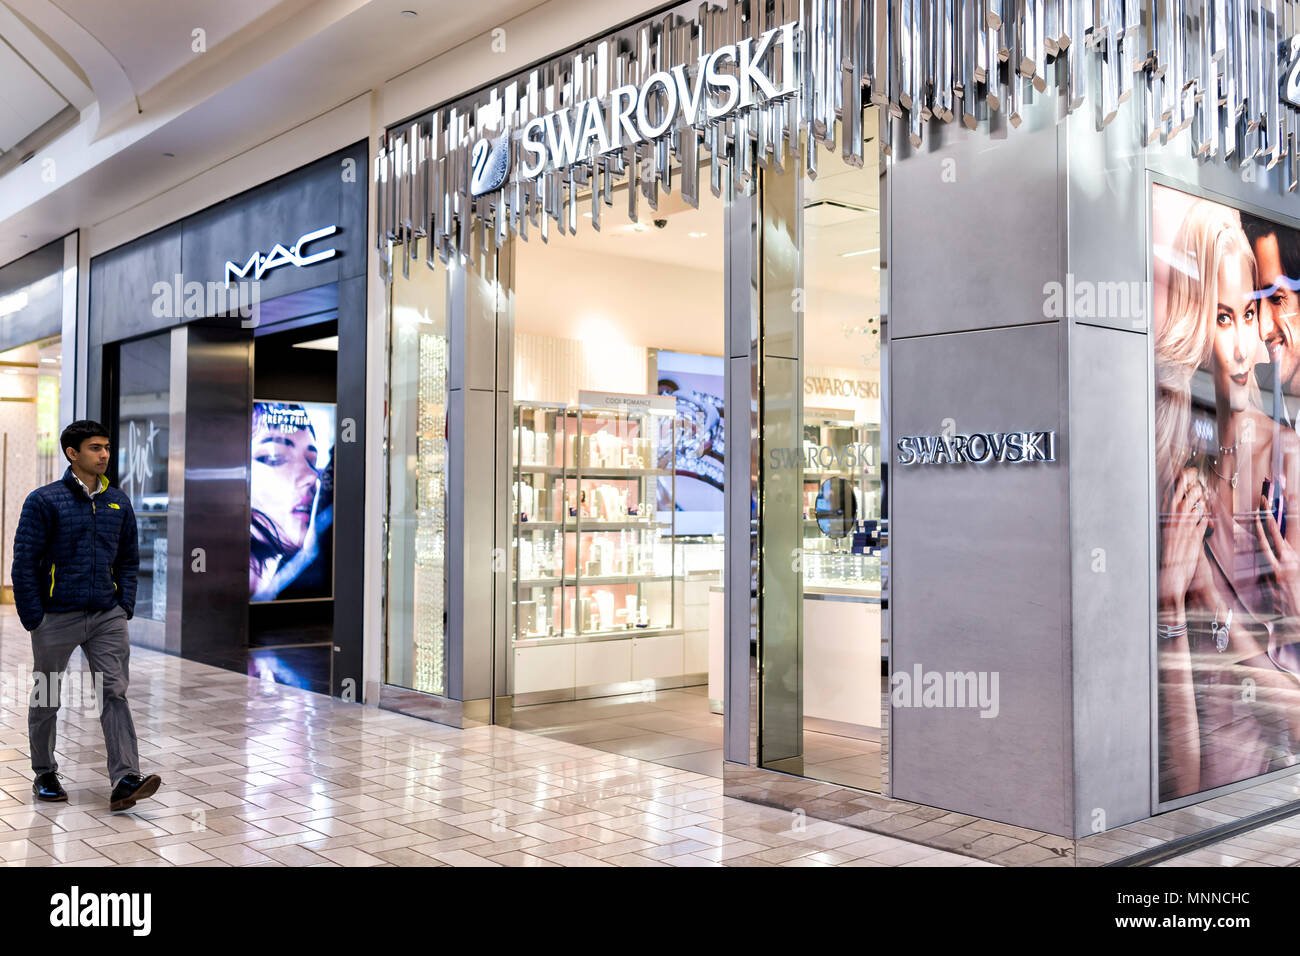 9406b0180fa Tysons, USA - January 26, 2018: Swarovski closeup store sign entrance  shopping in